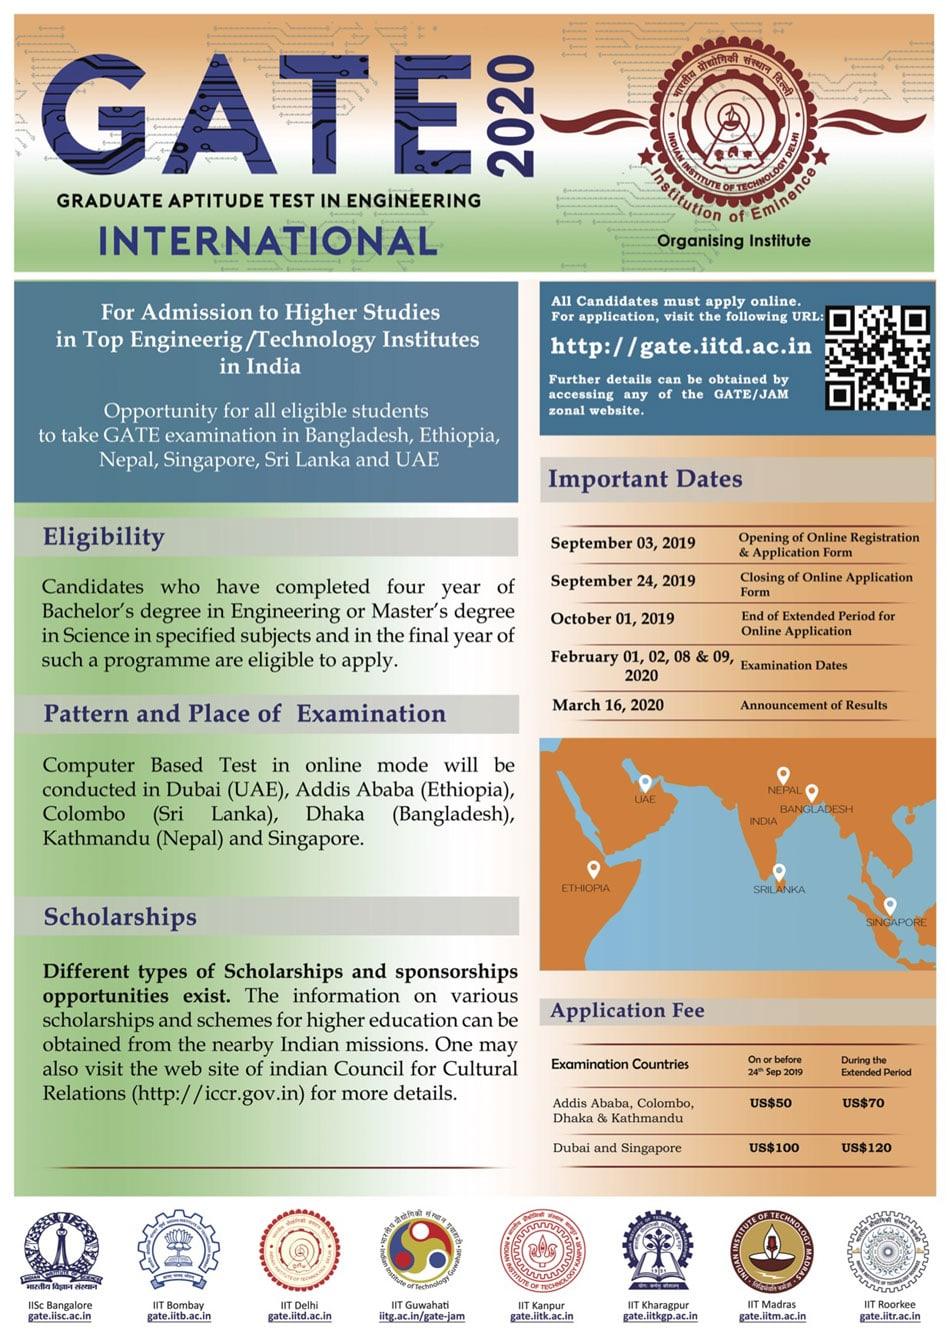 GATE 2020 international poster